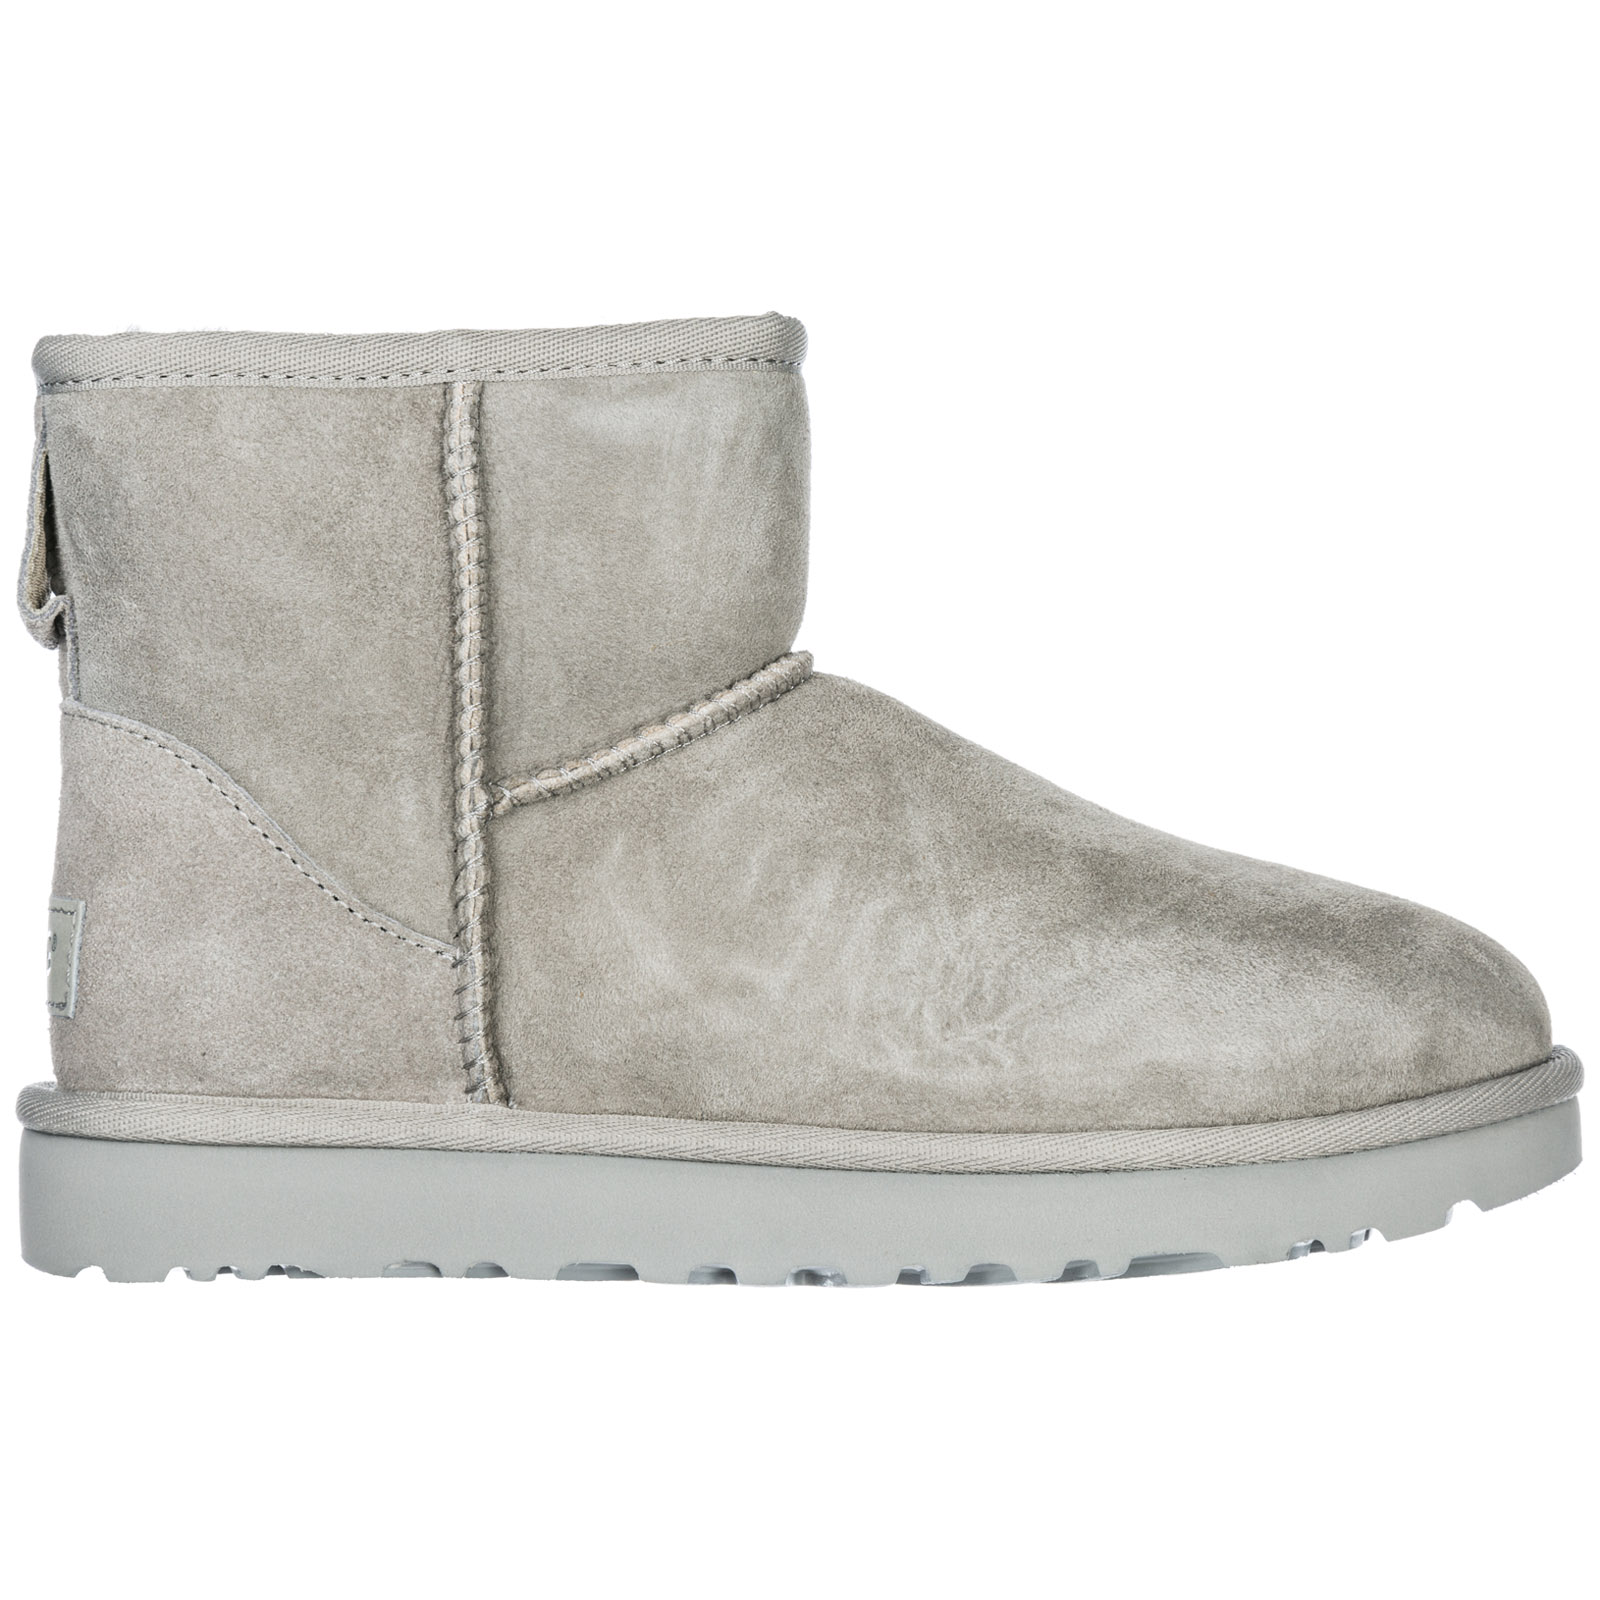 3d7cc43dd1bc8 Ugg Women S Suede Boots Classic Mini Ii In Grey